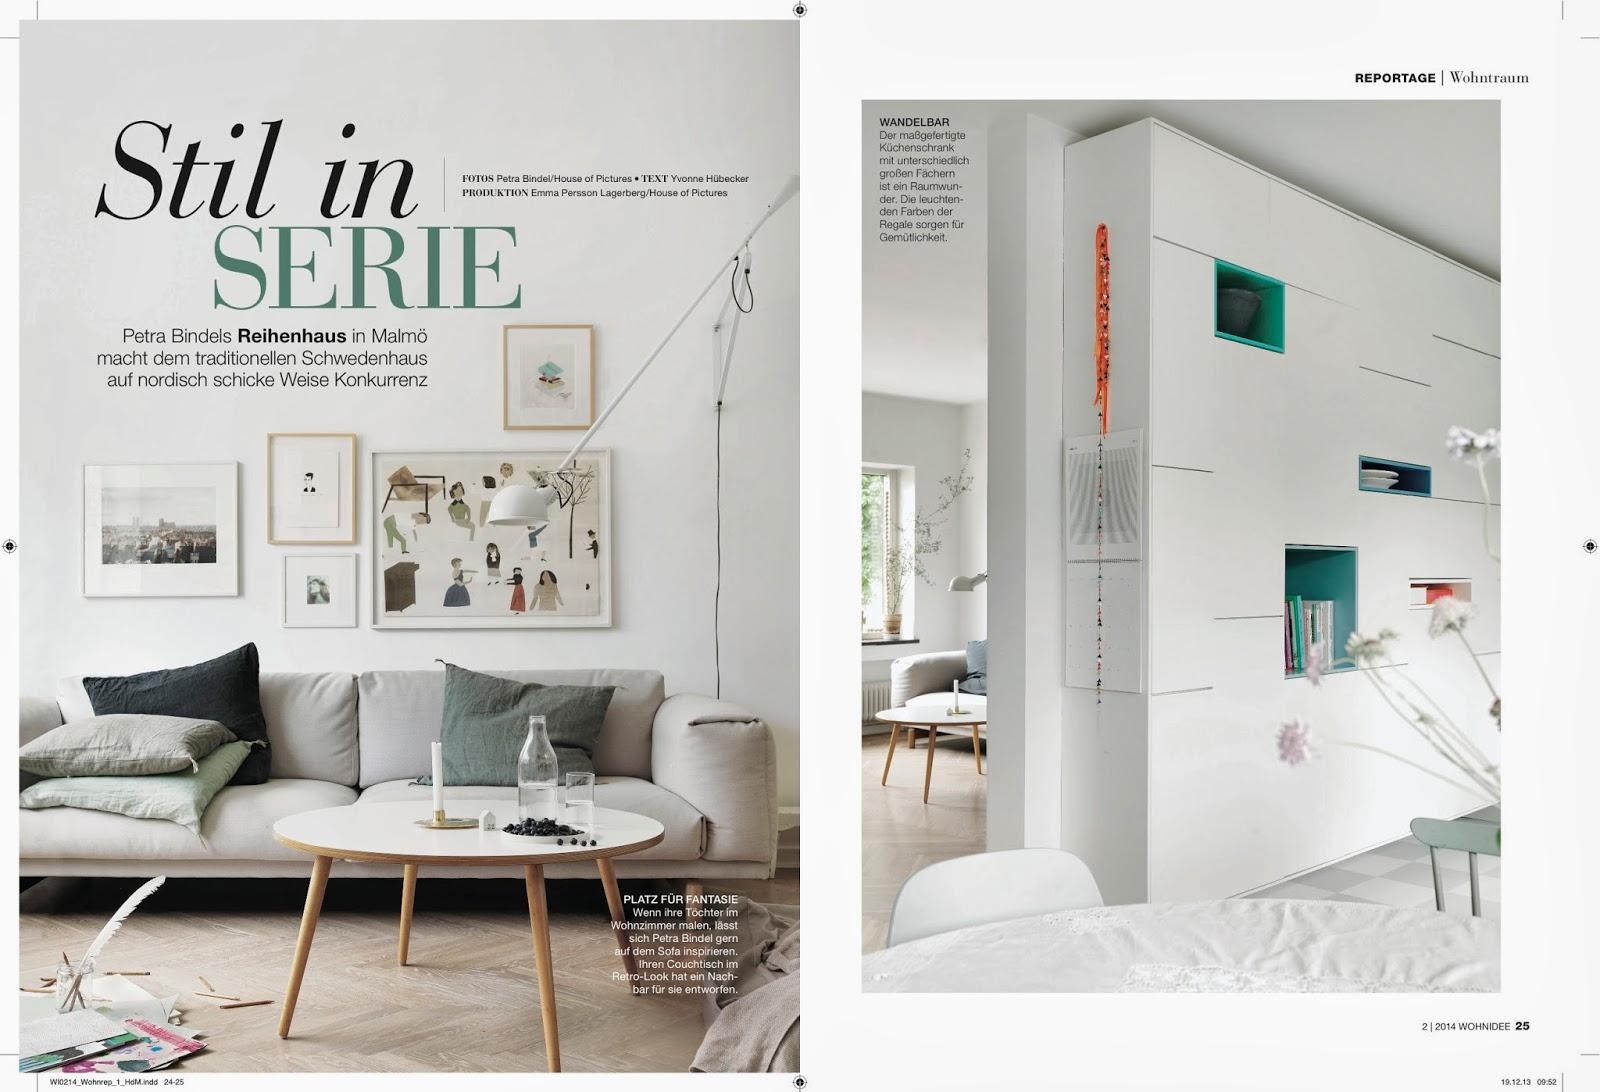 emma persson lagerberg wohnide. Black Bedroom Furniture Sets. Home Design Ideas